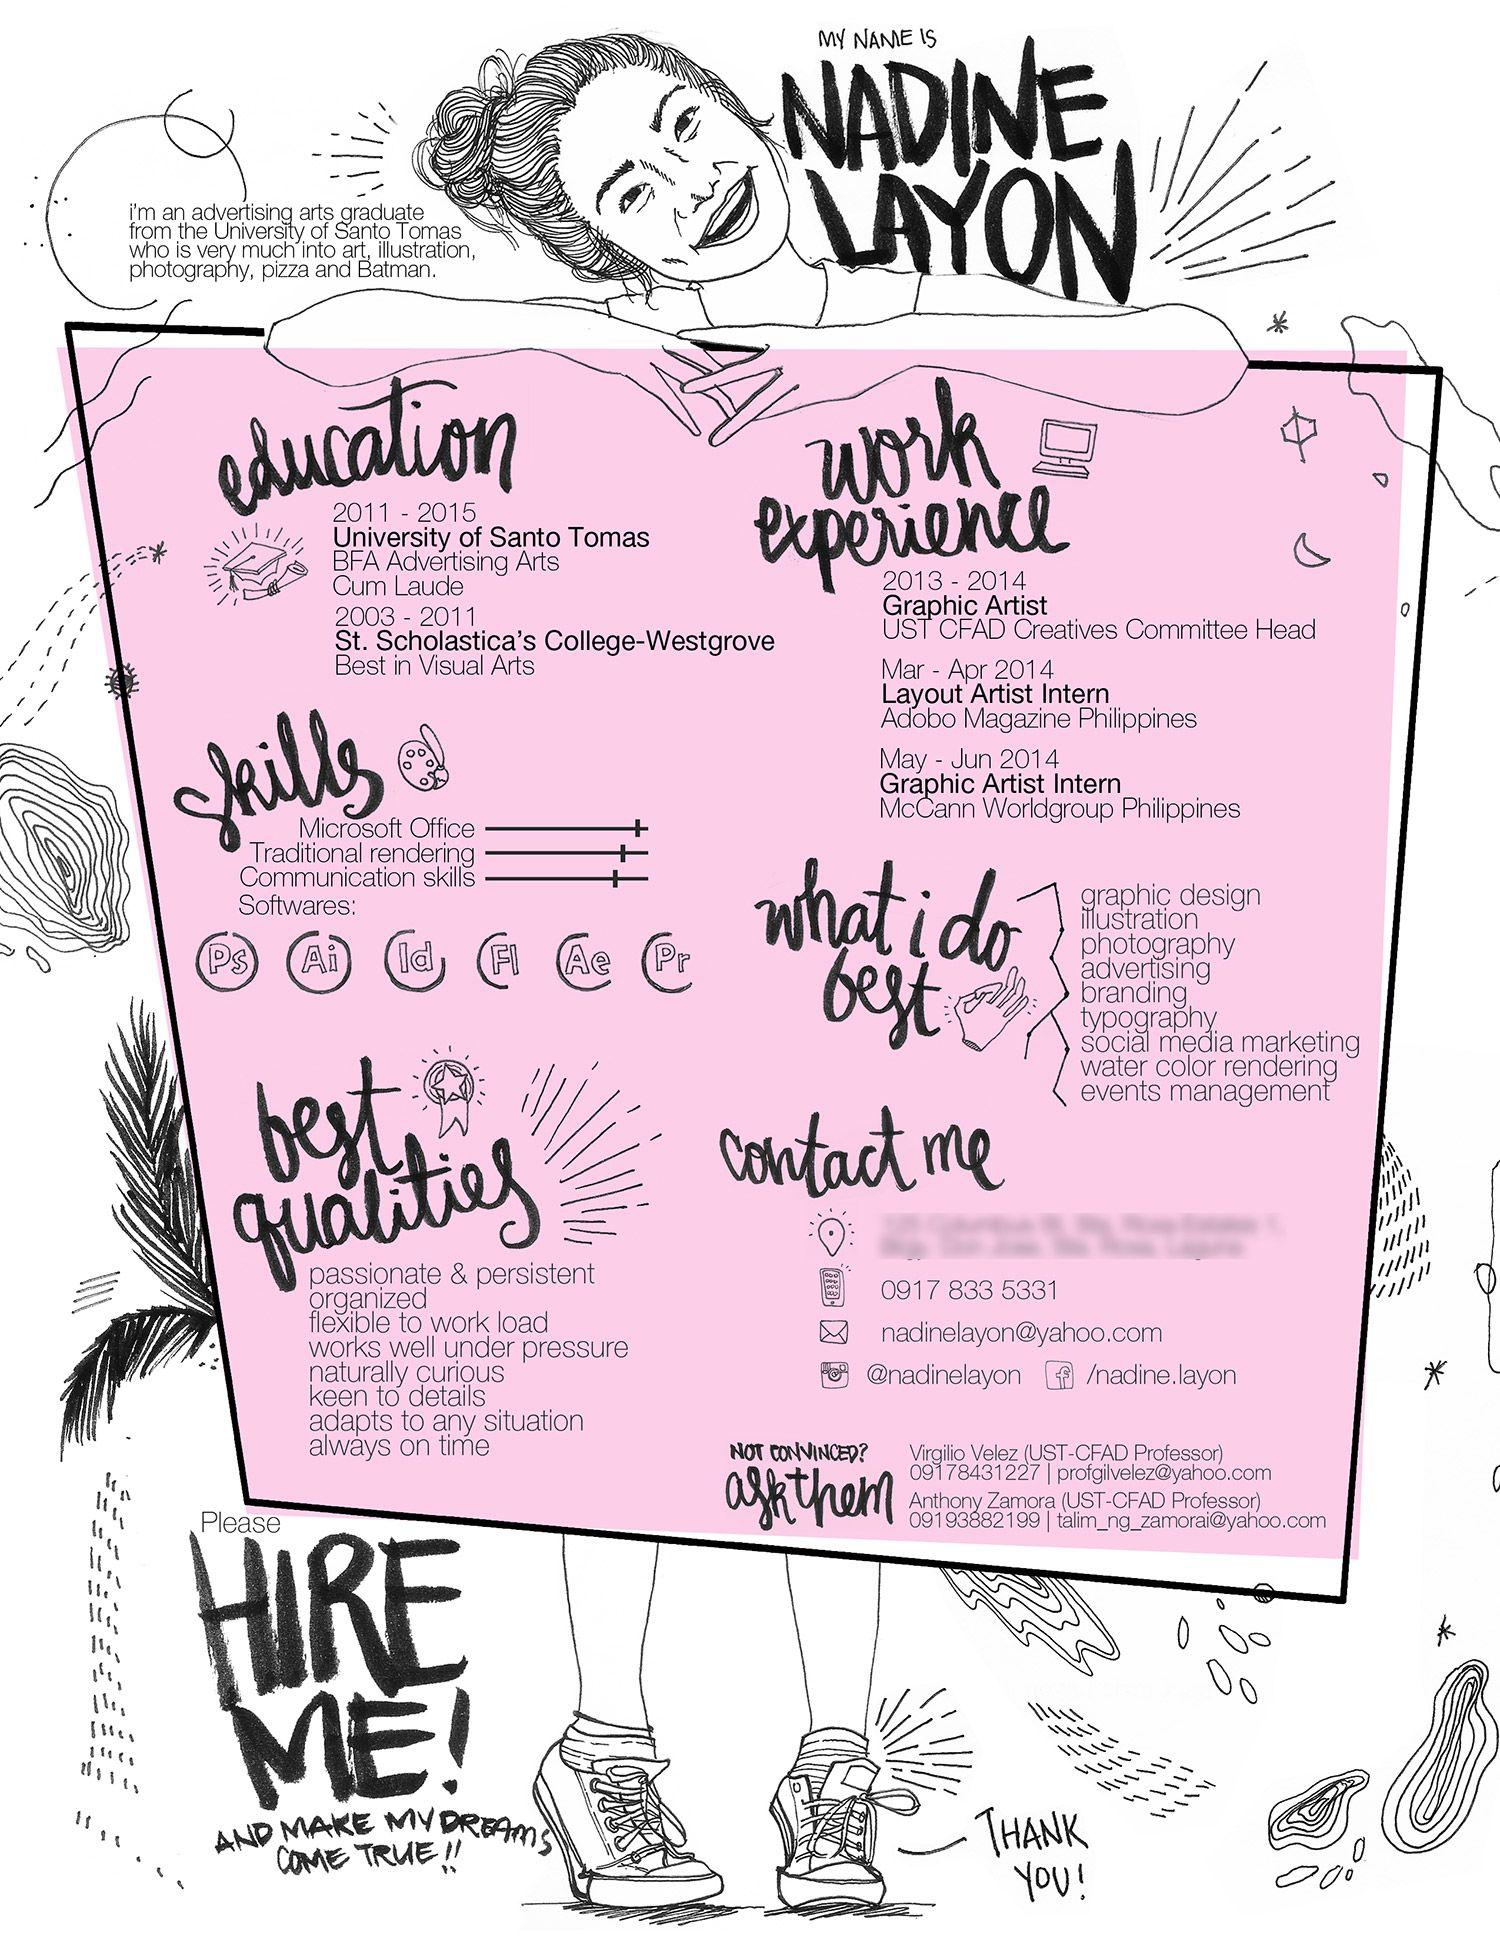 25 Creative and Beautiful Resume & CV Examples